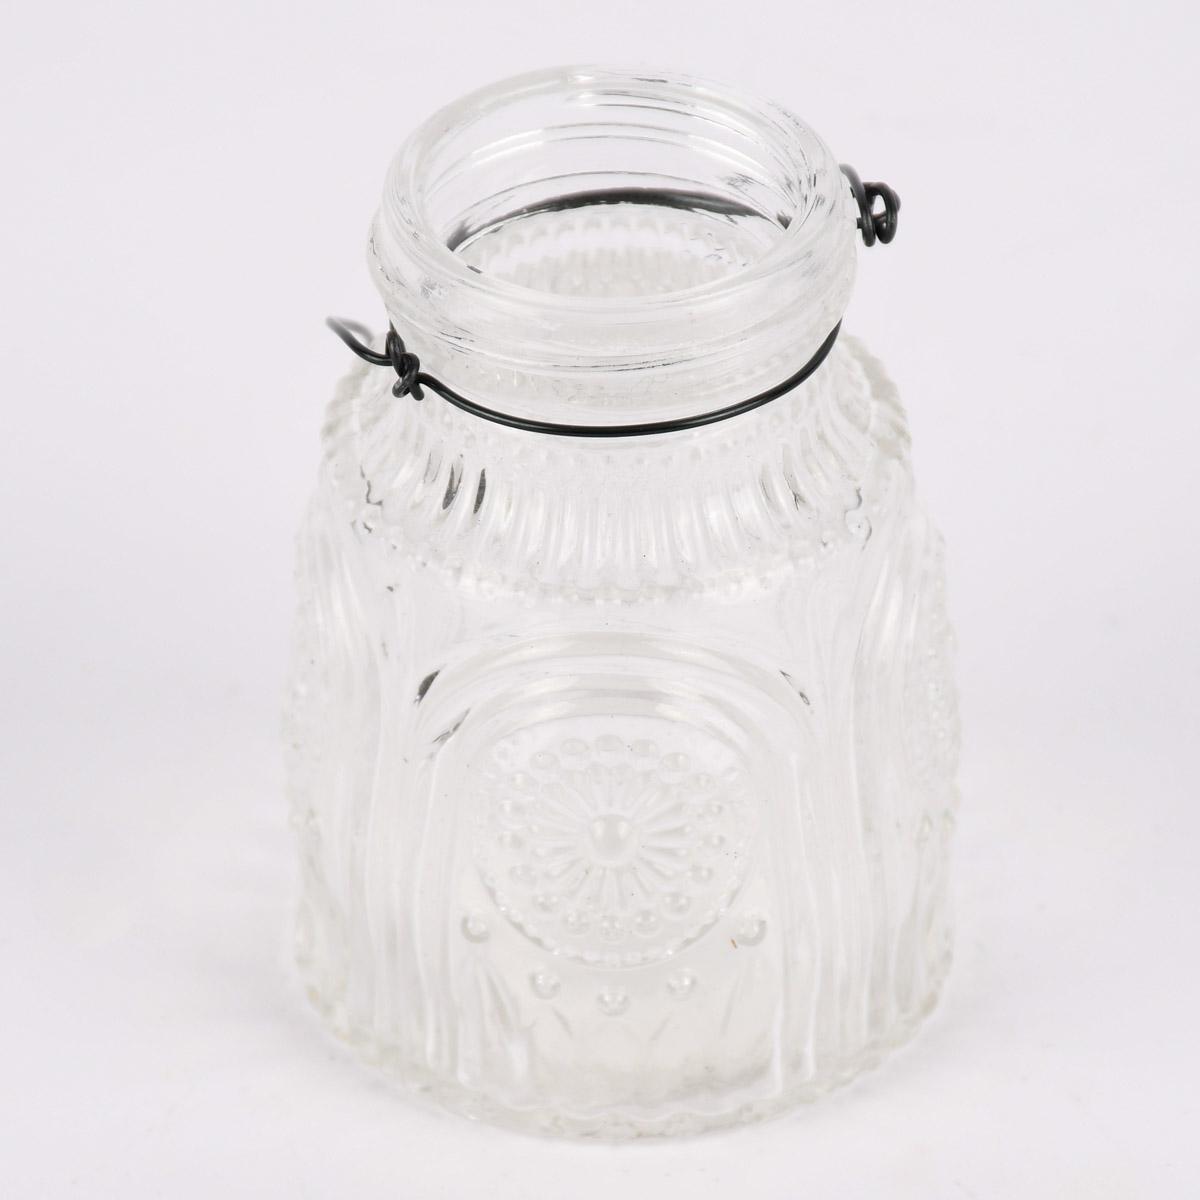 Vase Laterne geprägt Mandala Glas mit Henkel aus Draht klar 5,5x8cm